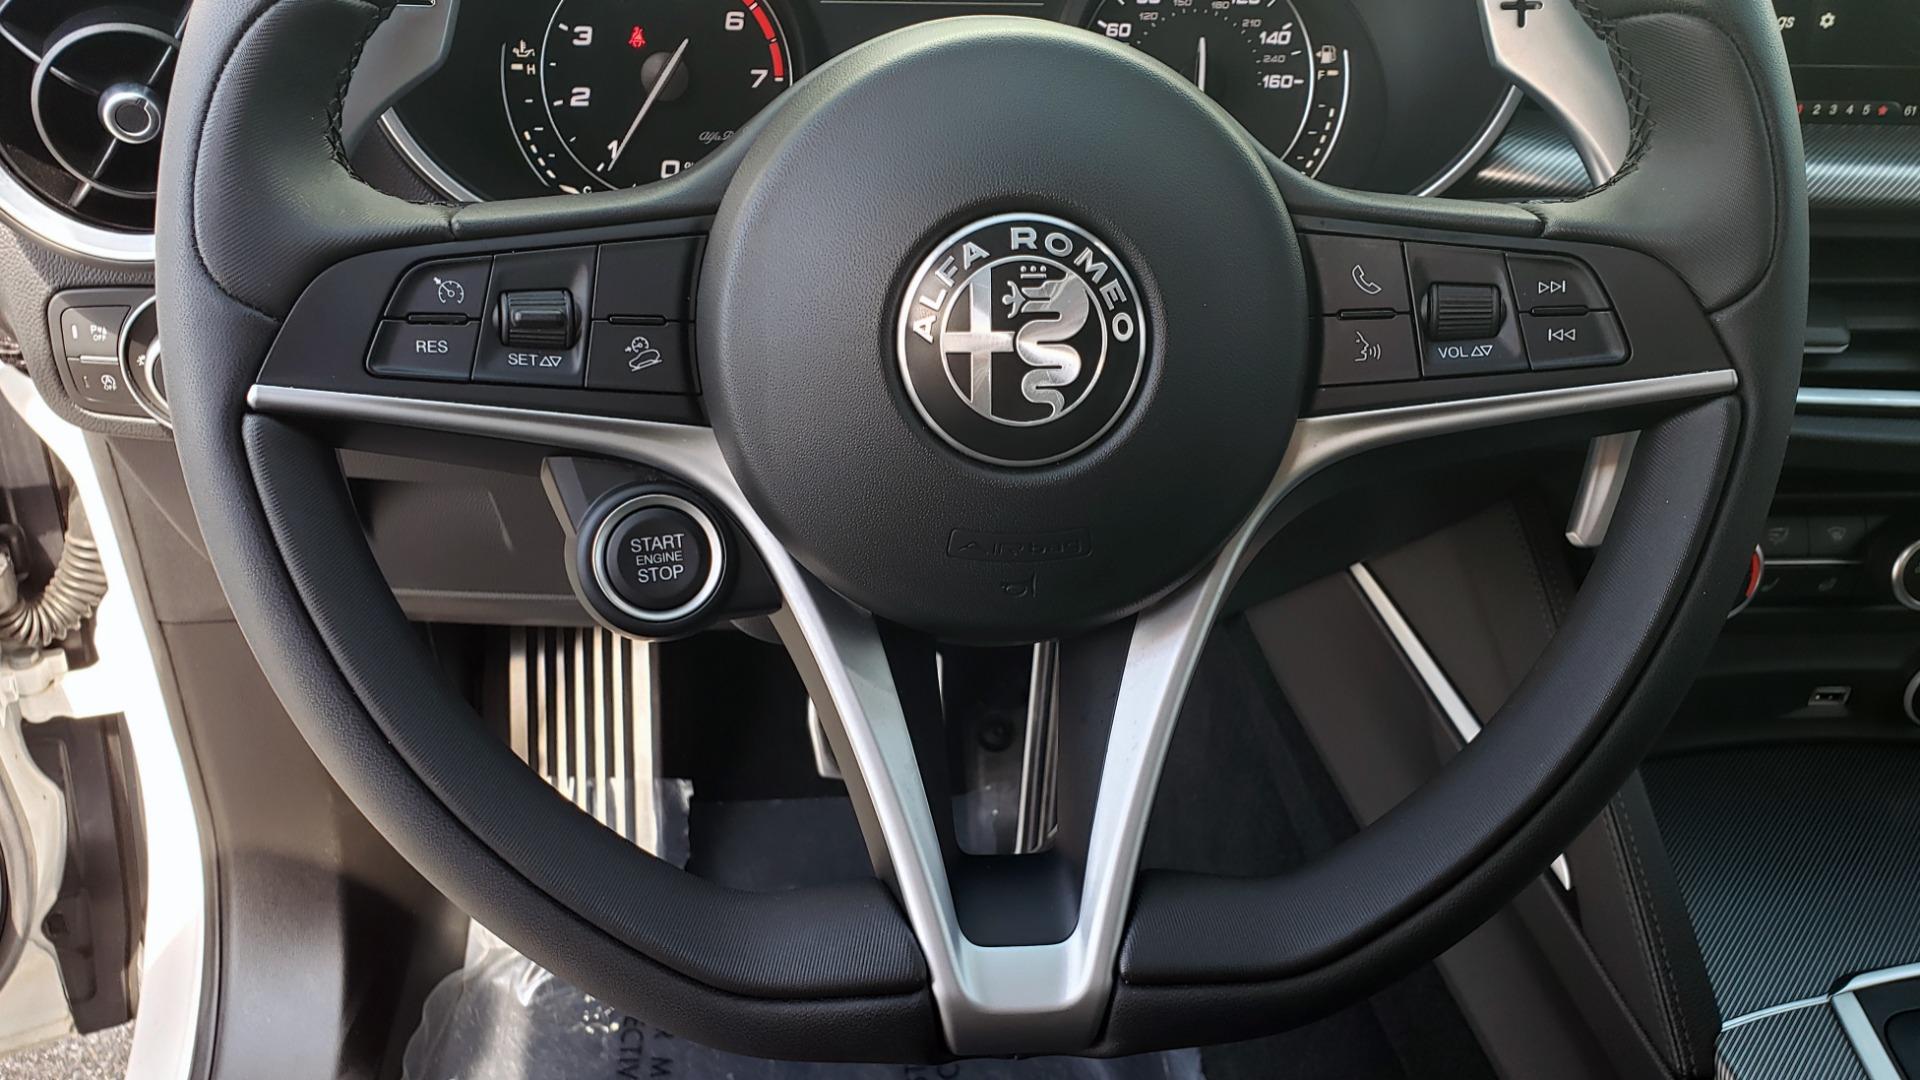 Used 2019 Alfa Romeo STELVIO TI SPORT AWD / 2.0L TURBO / 8-SPD AUTO / DRVR ASST / REARVIEW for sale $37,495 at Formula Imports in Charlotte NC 28227 43